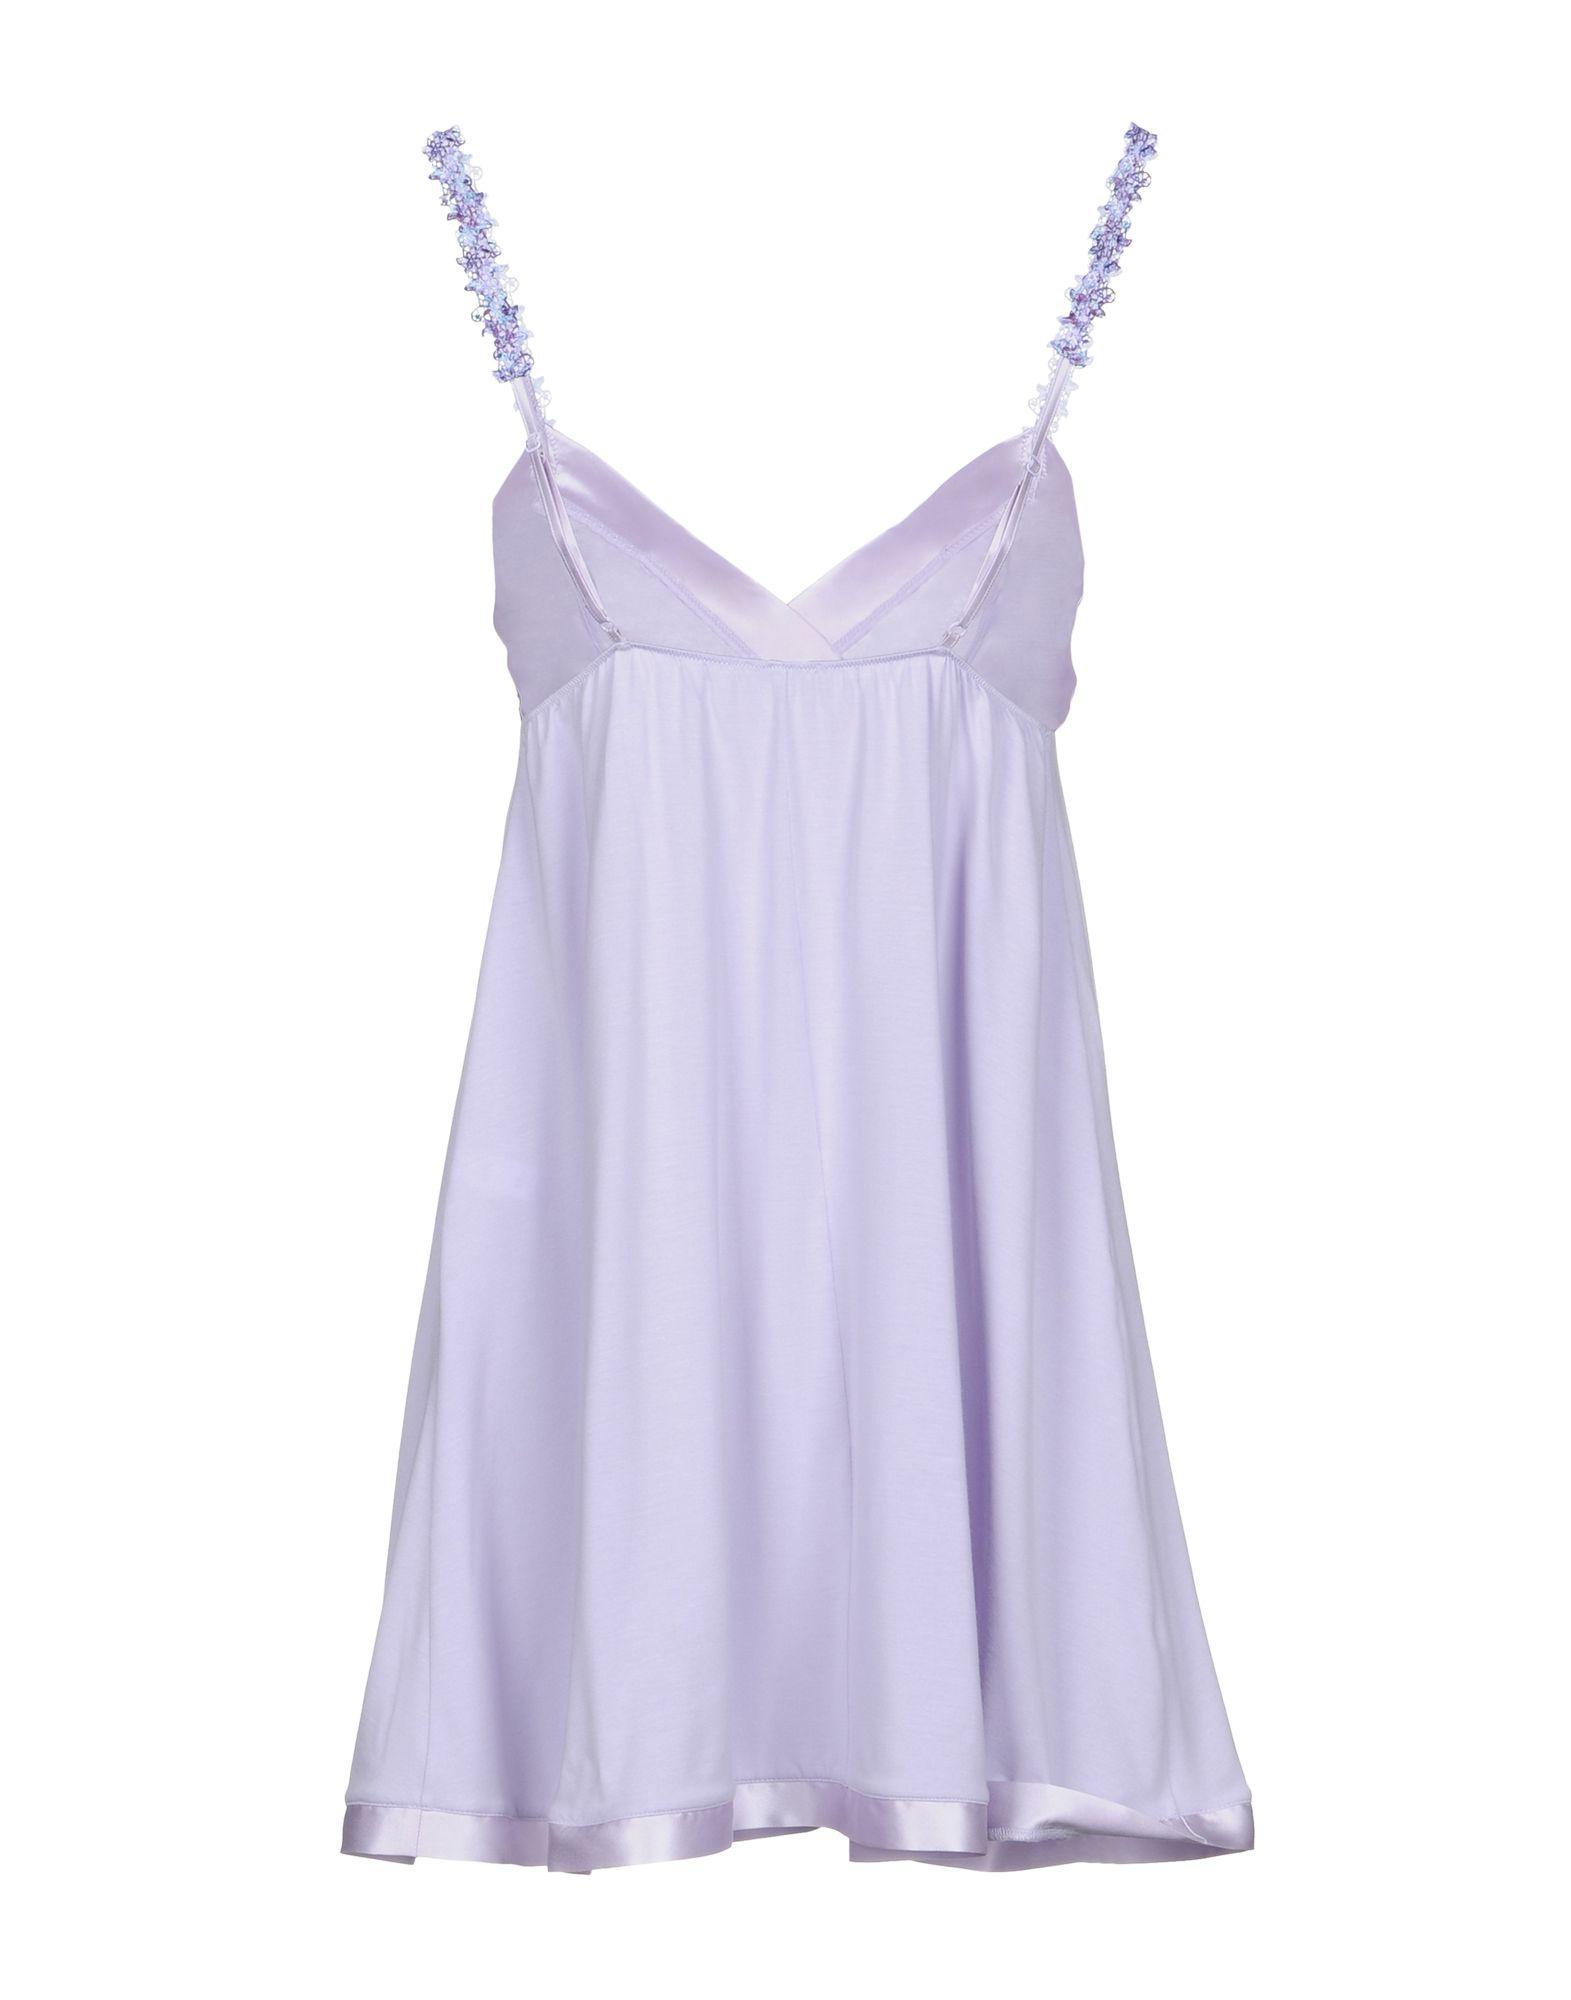 571d7bb372 Lyst - La Perla Slip in Purple